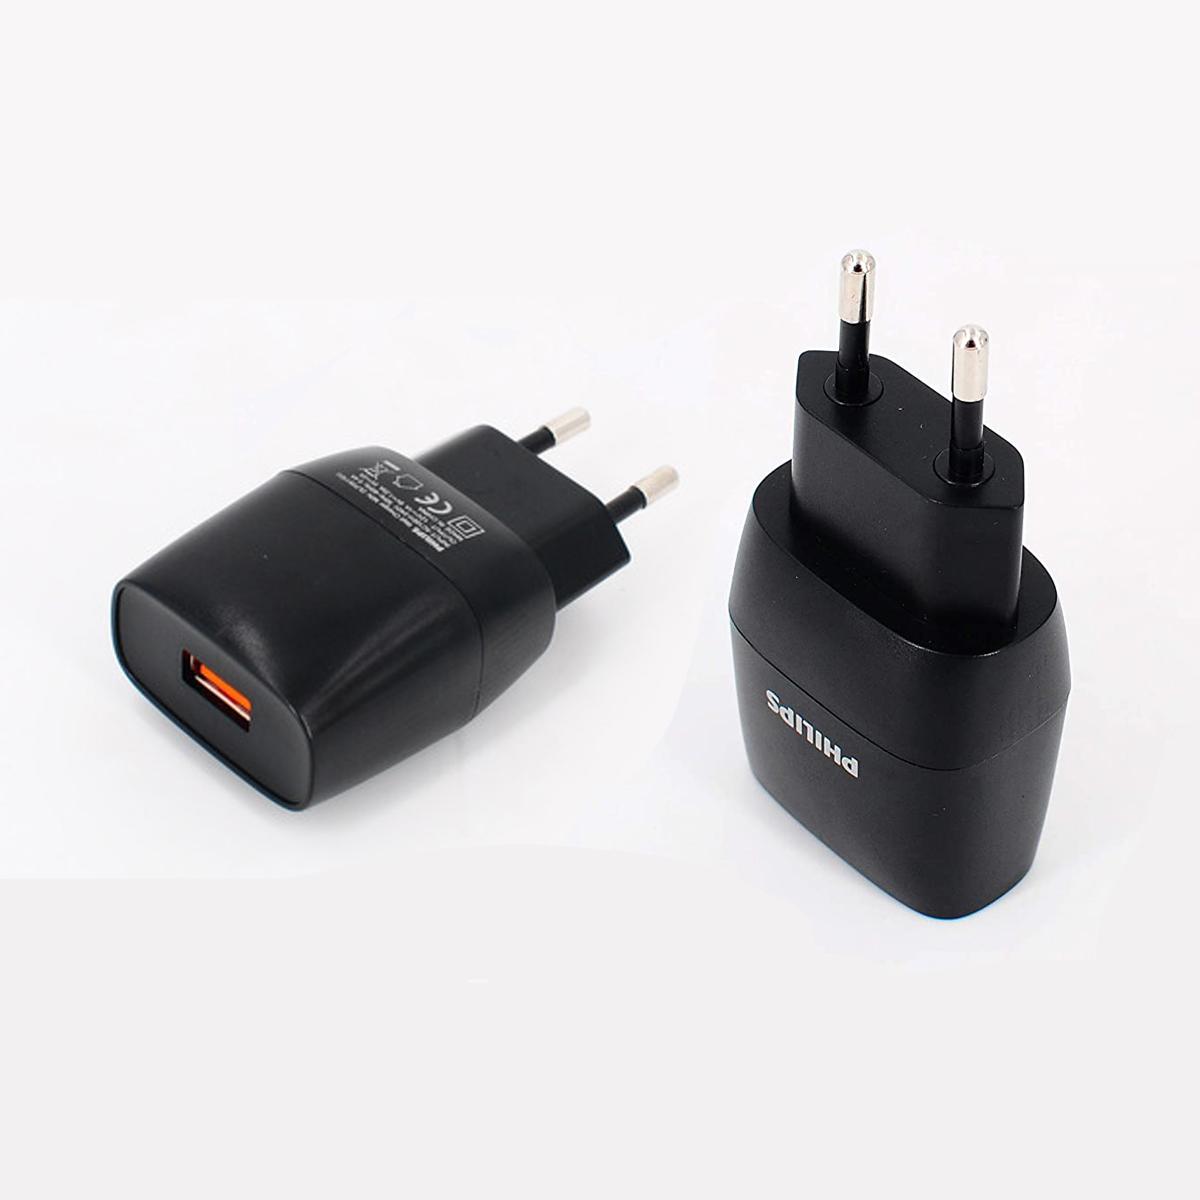 Carregador Turbo Para Celular Philips Cabo USB / USB-C Universal Preto DPL2310C